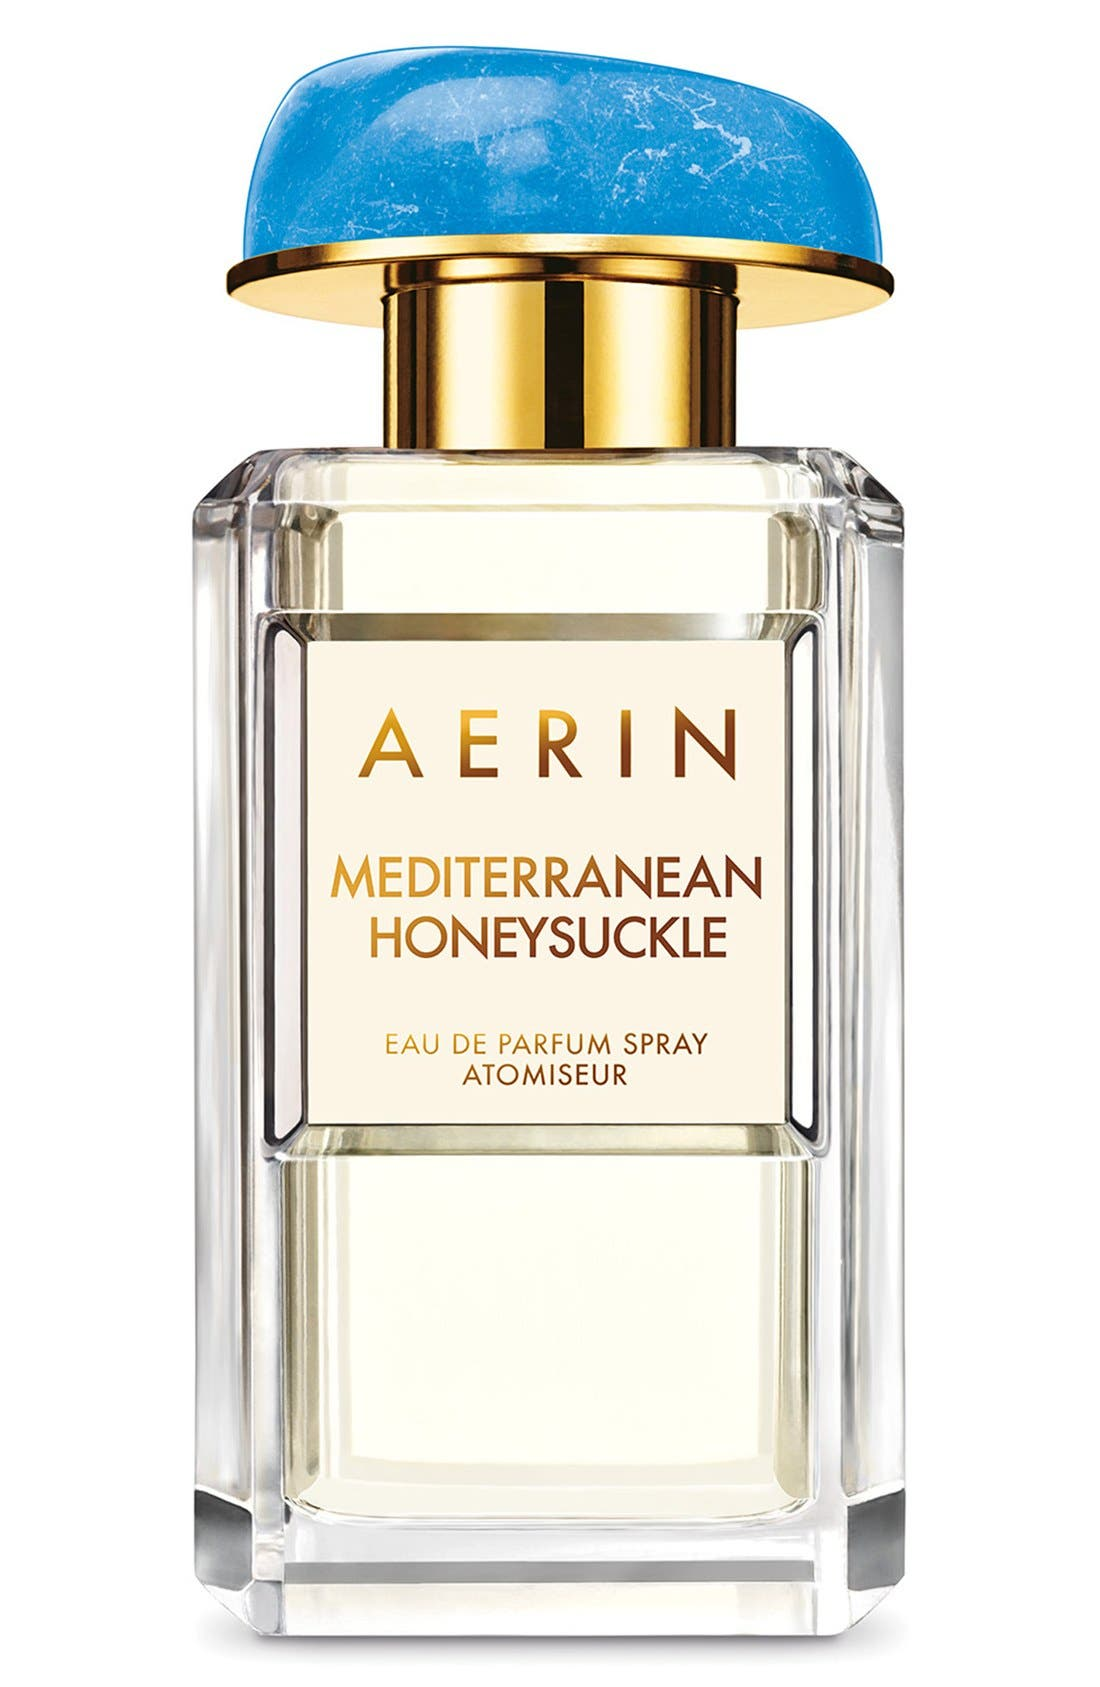 AERIN Beauty 'Mediterranean Honeysuckle' Eau de Parfum